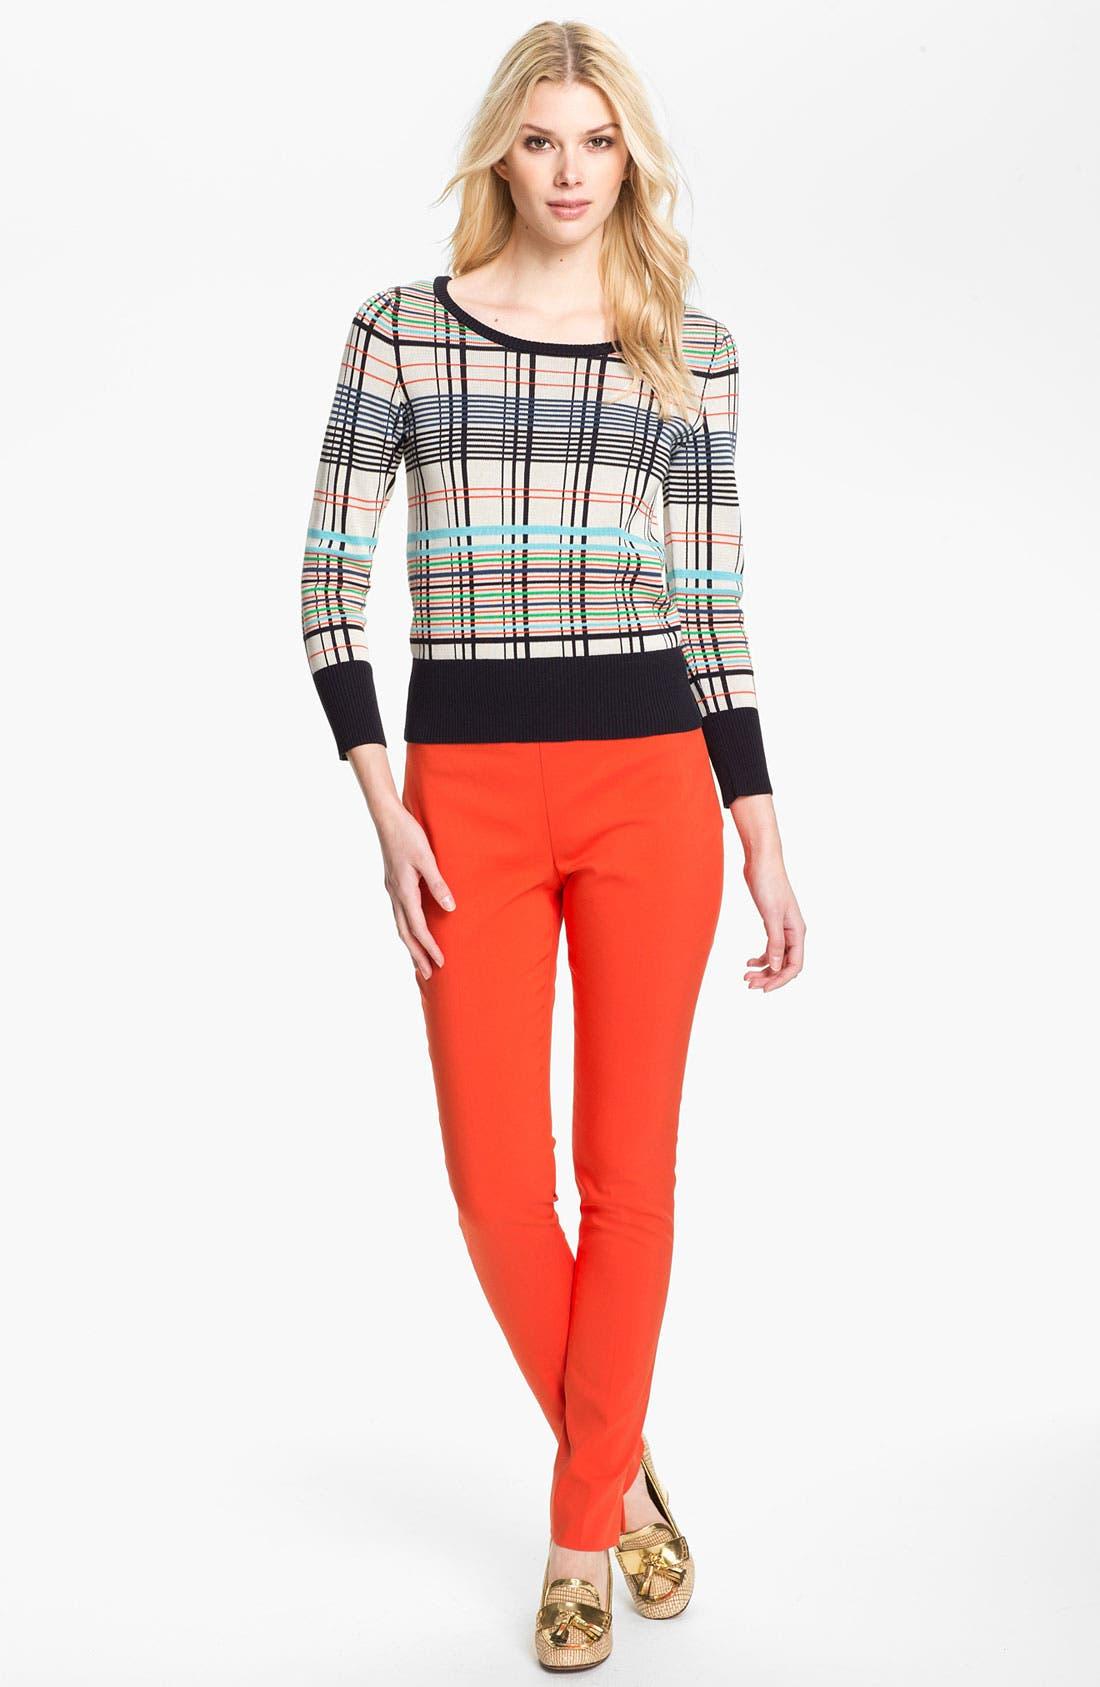 Alternate Image 1 Selected - Tory Burch 'Falon' Sweater